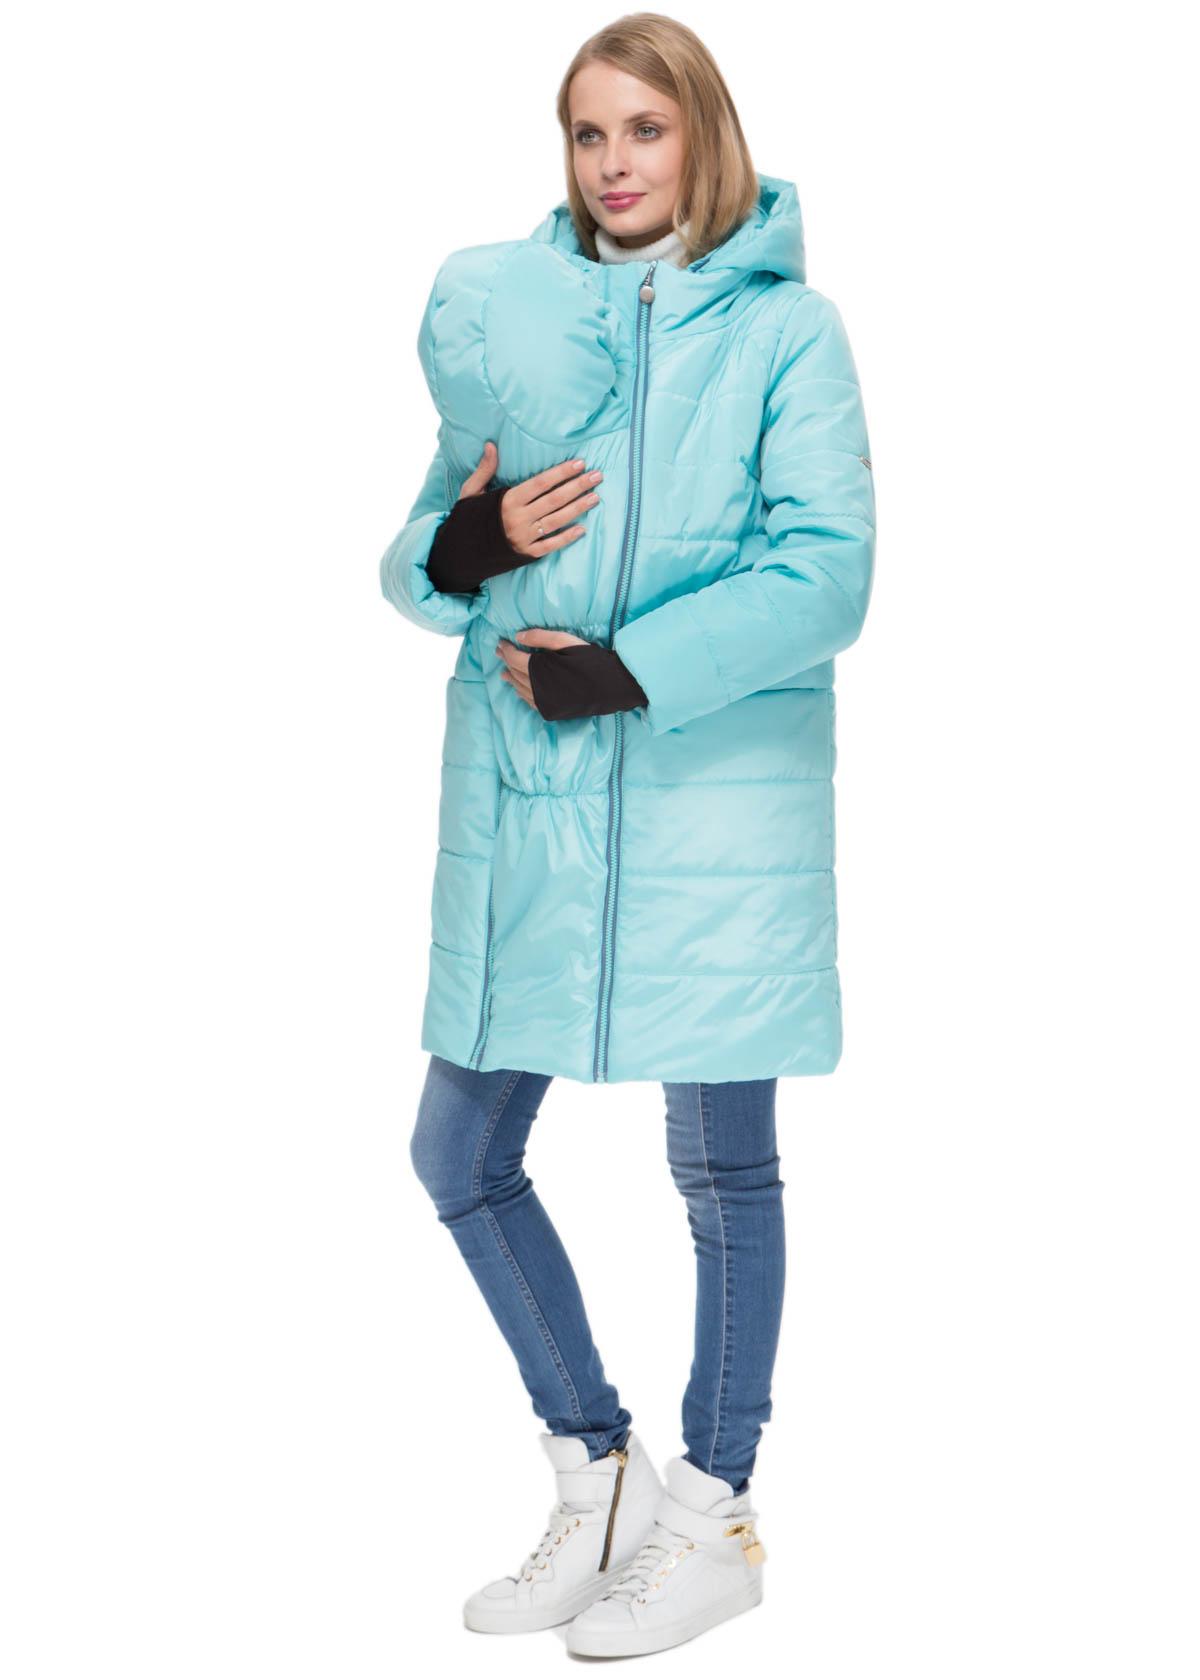 e79af45077eb ПОД ЗАКАЗ  Зимние куртки   Интернет-магазин MamaMia.by. Слинги ...